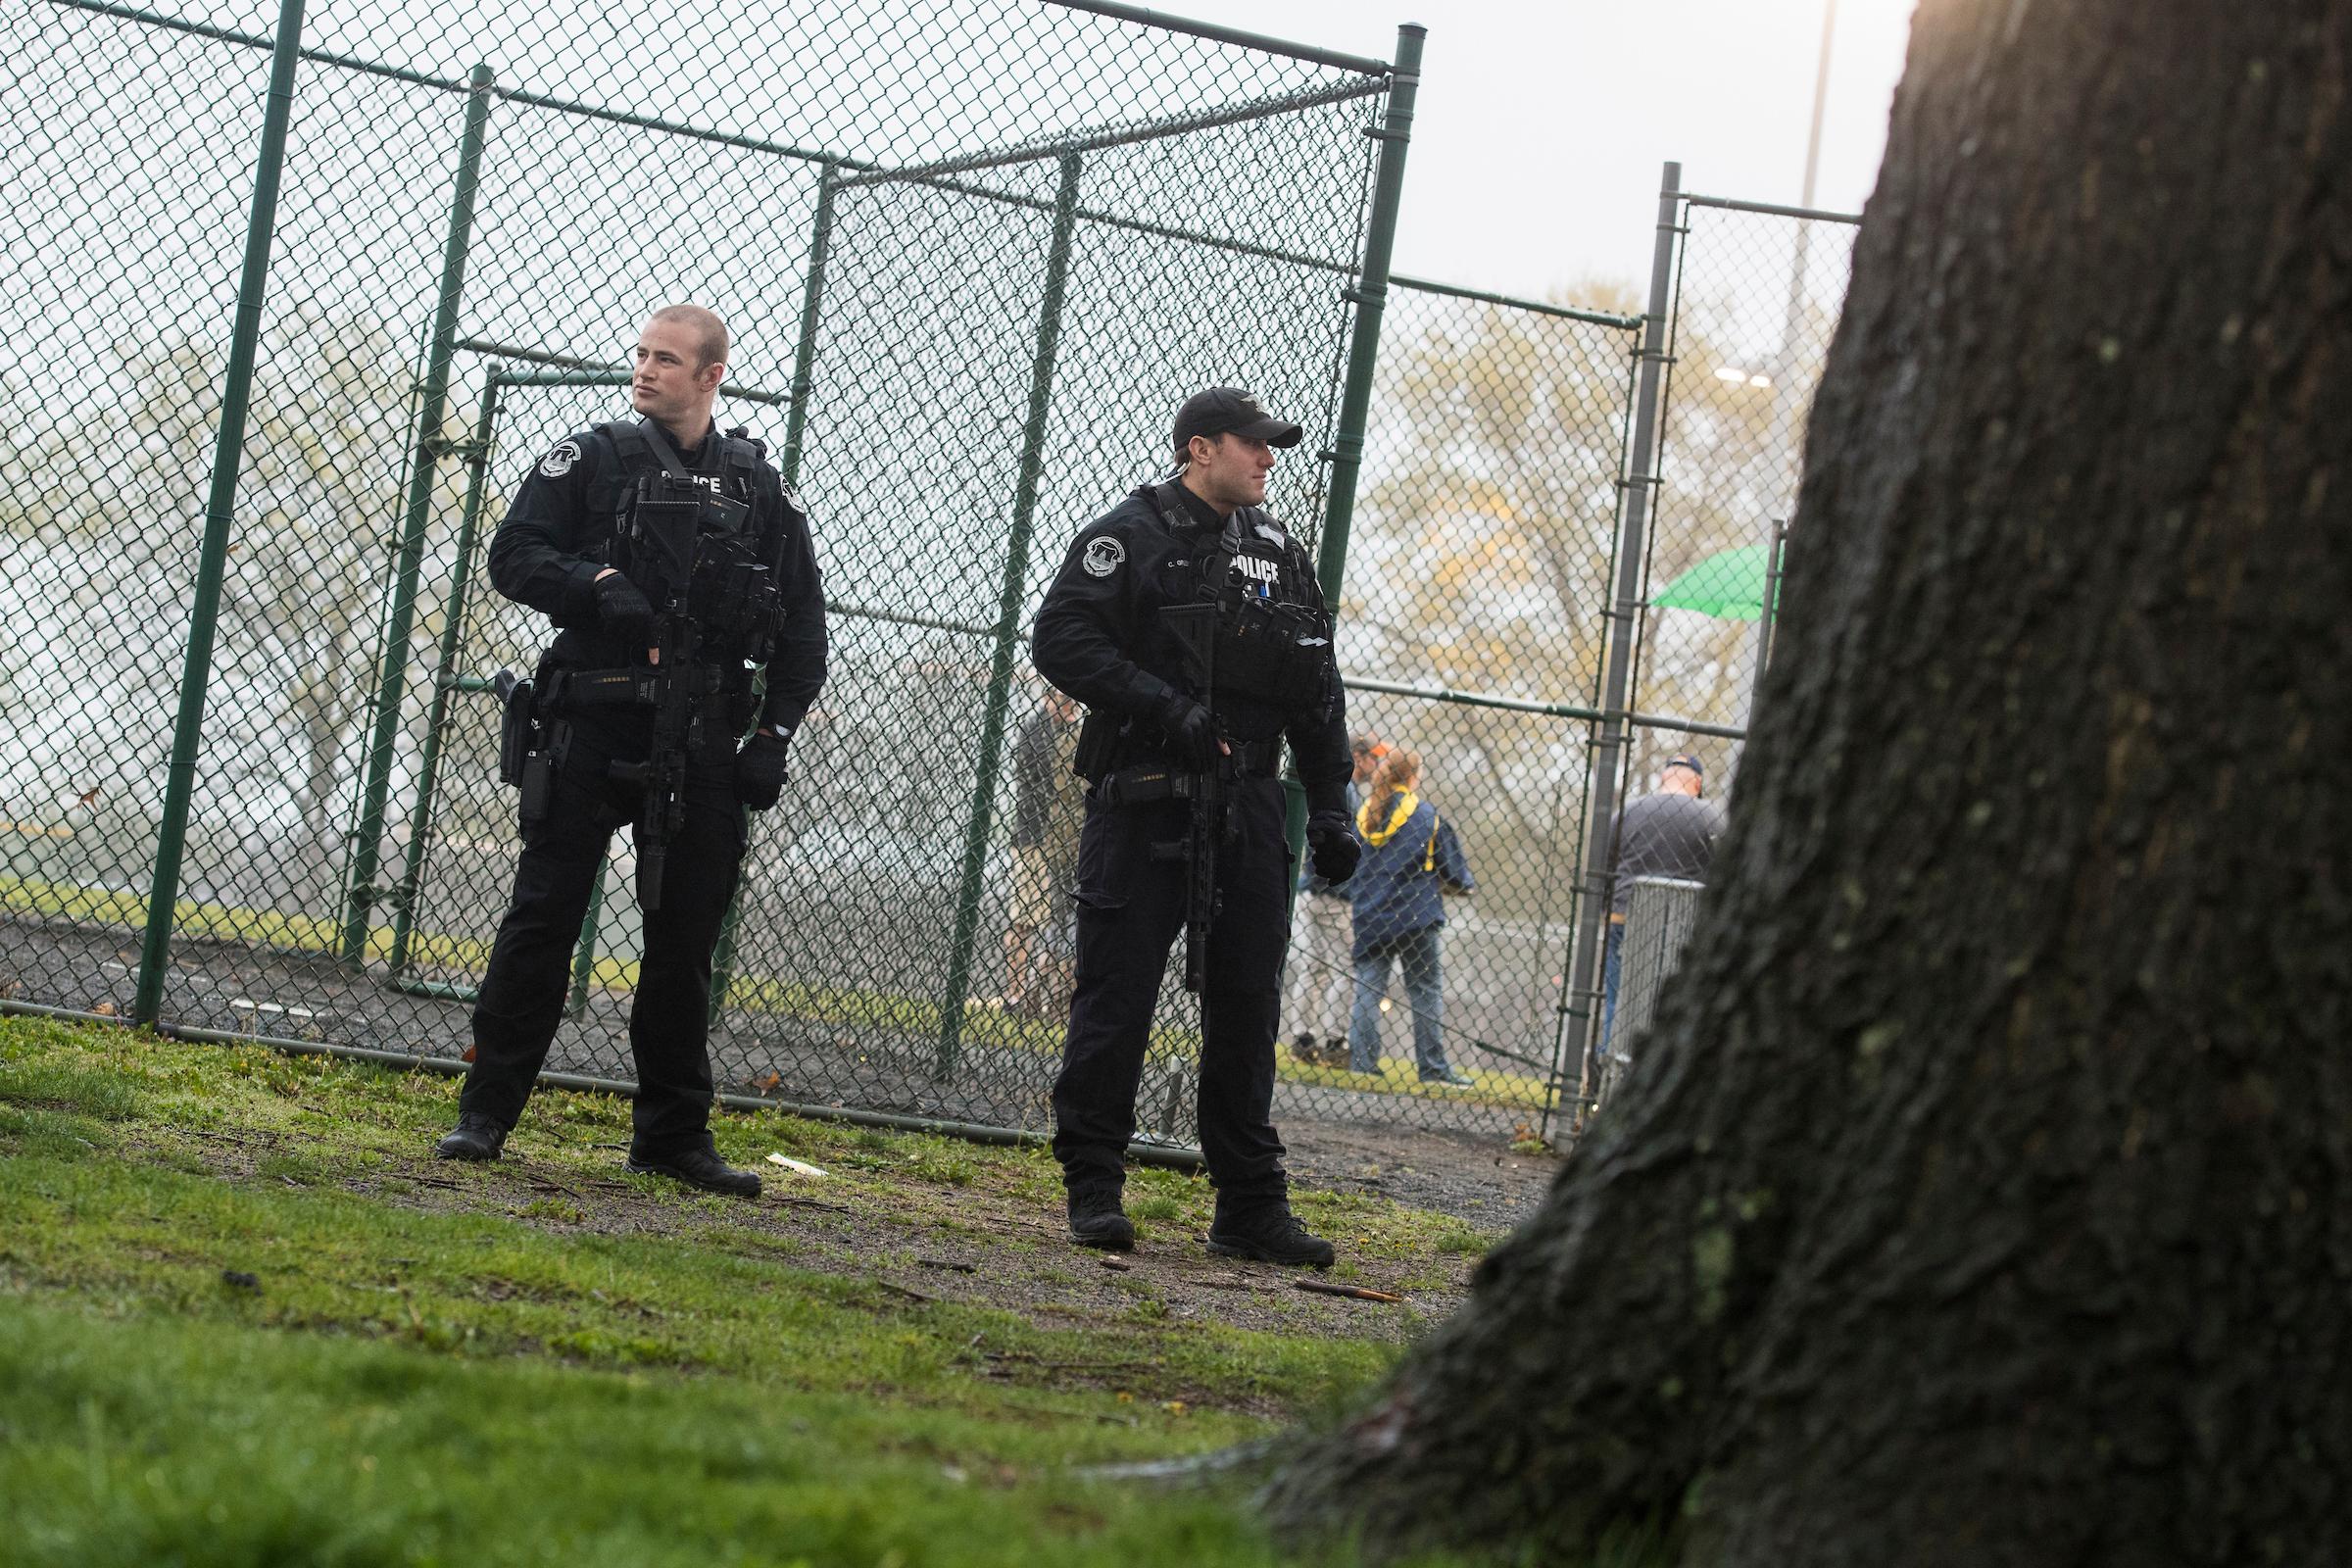 GOP Lawmakers Return to Baseball Practice Under Heavy Security